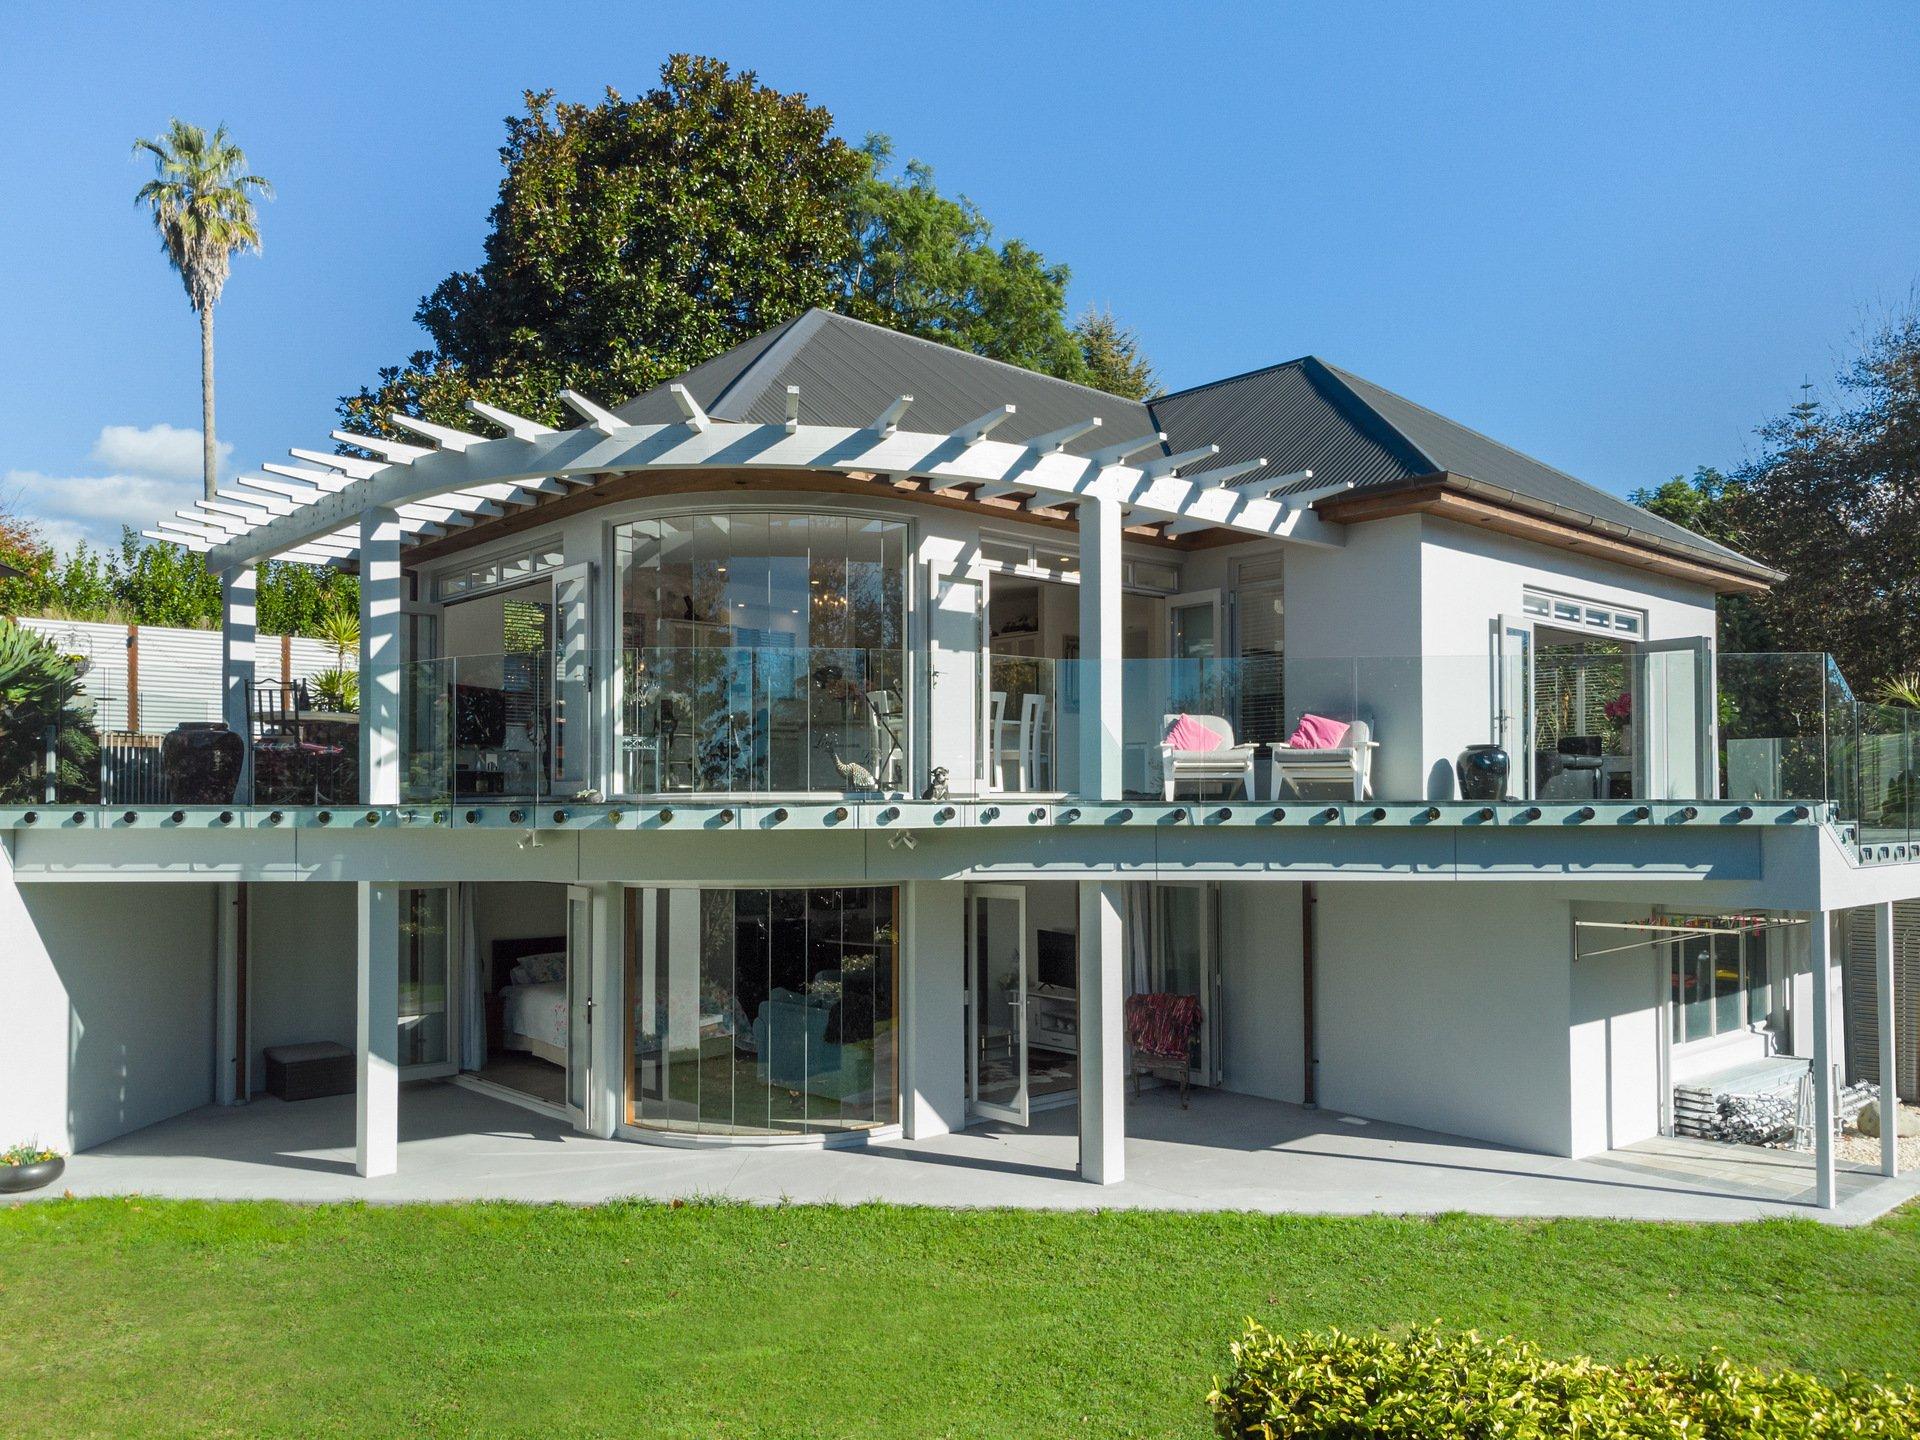 House in Whakamarama, Bay of Plenty, New Zealand 1